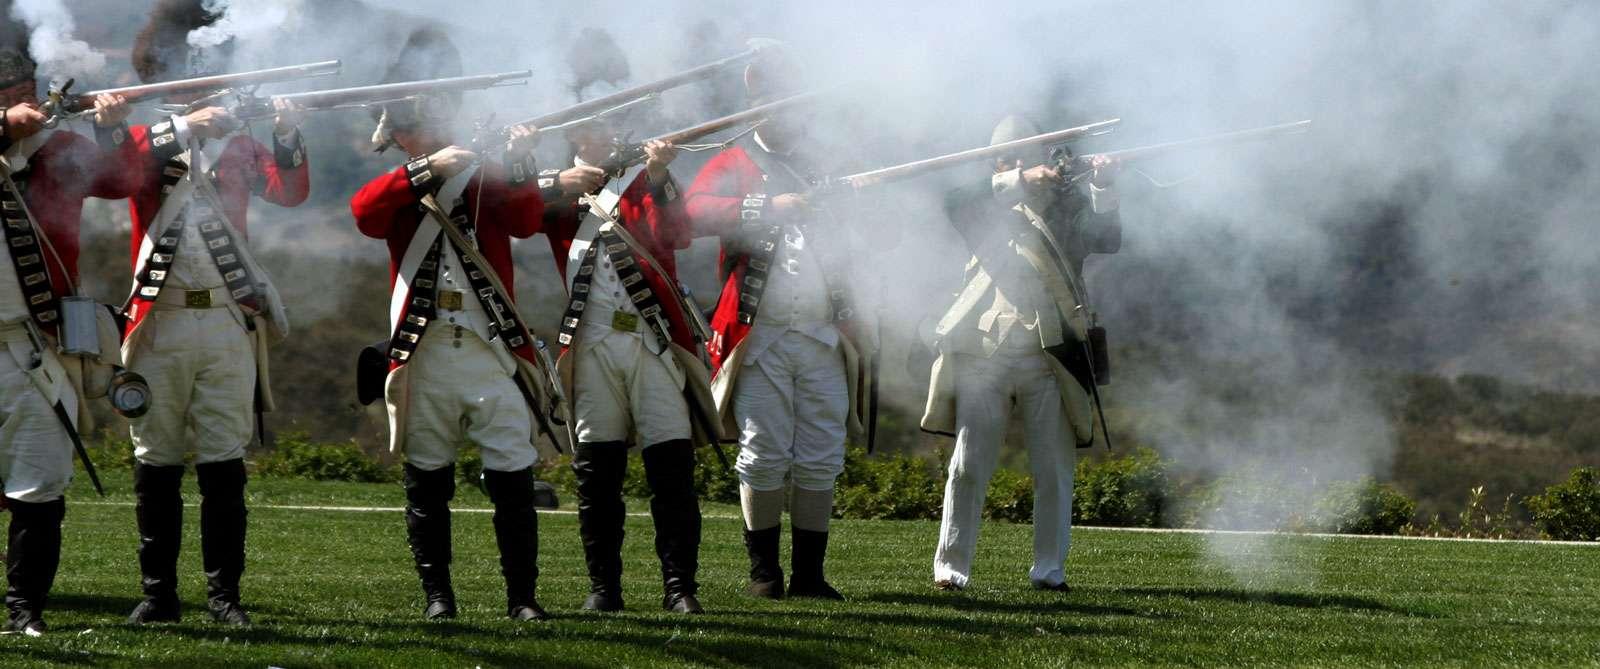 bigstock-British-Army-Firing-A-Guns-1428958